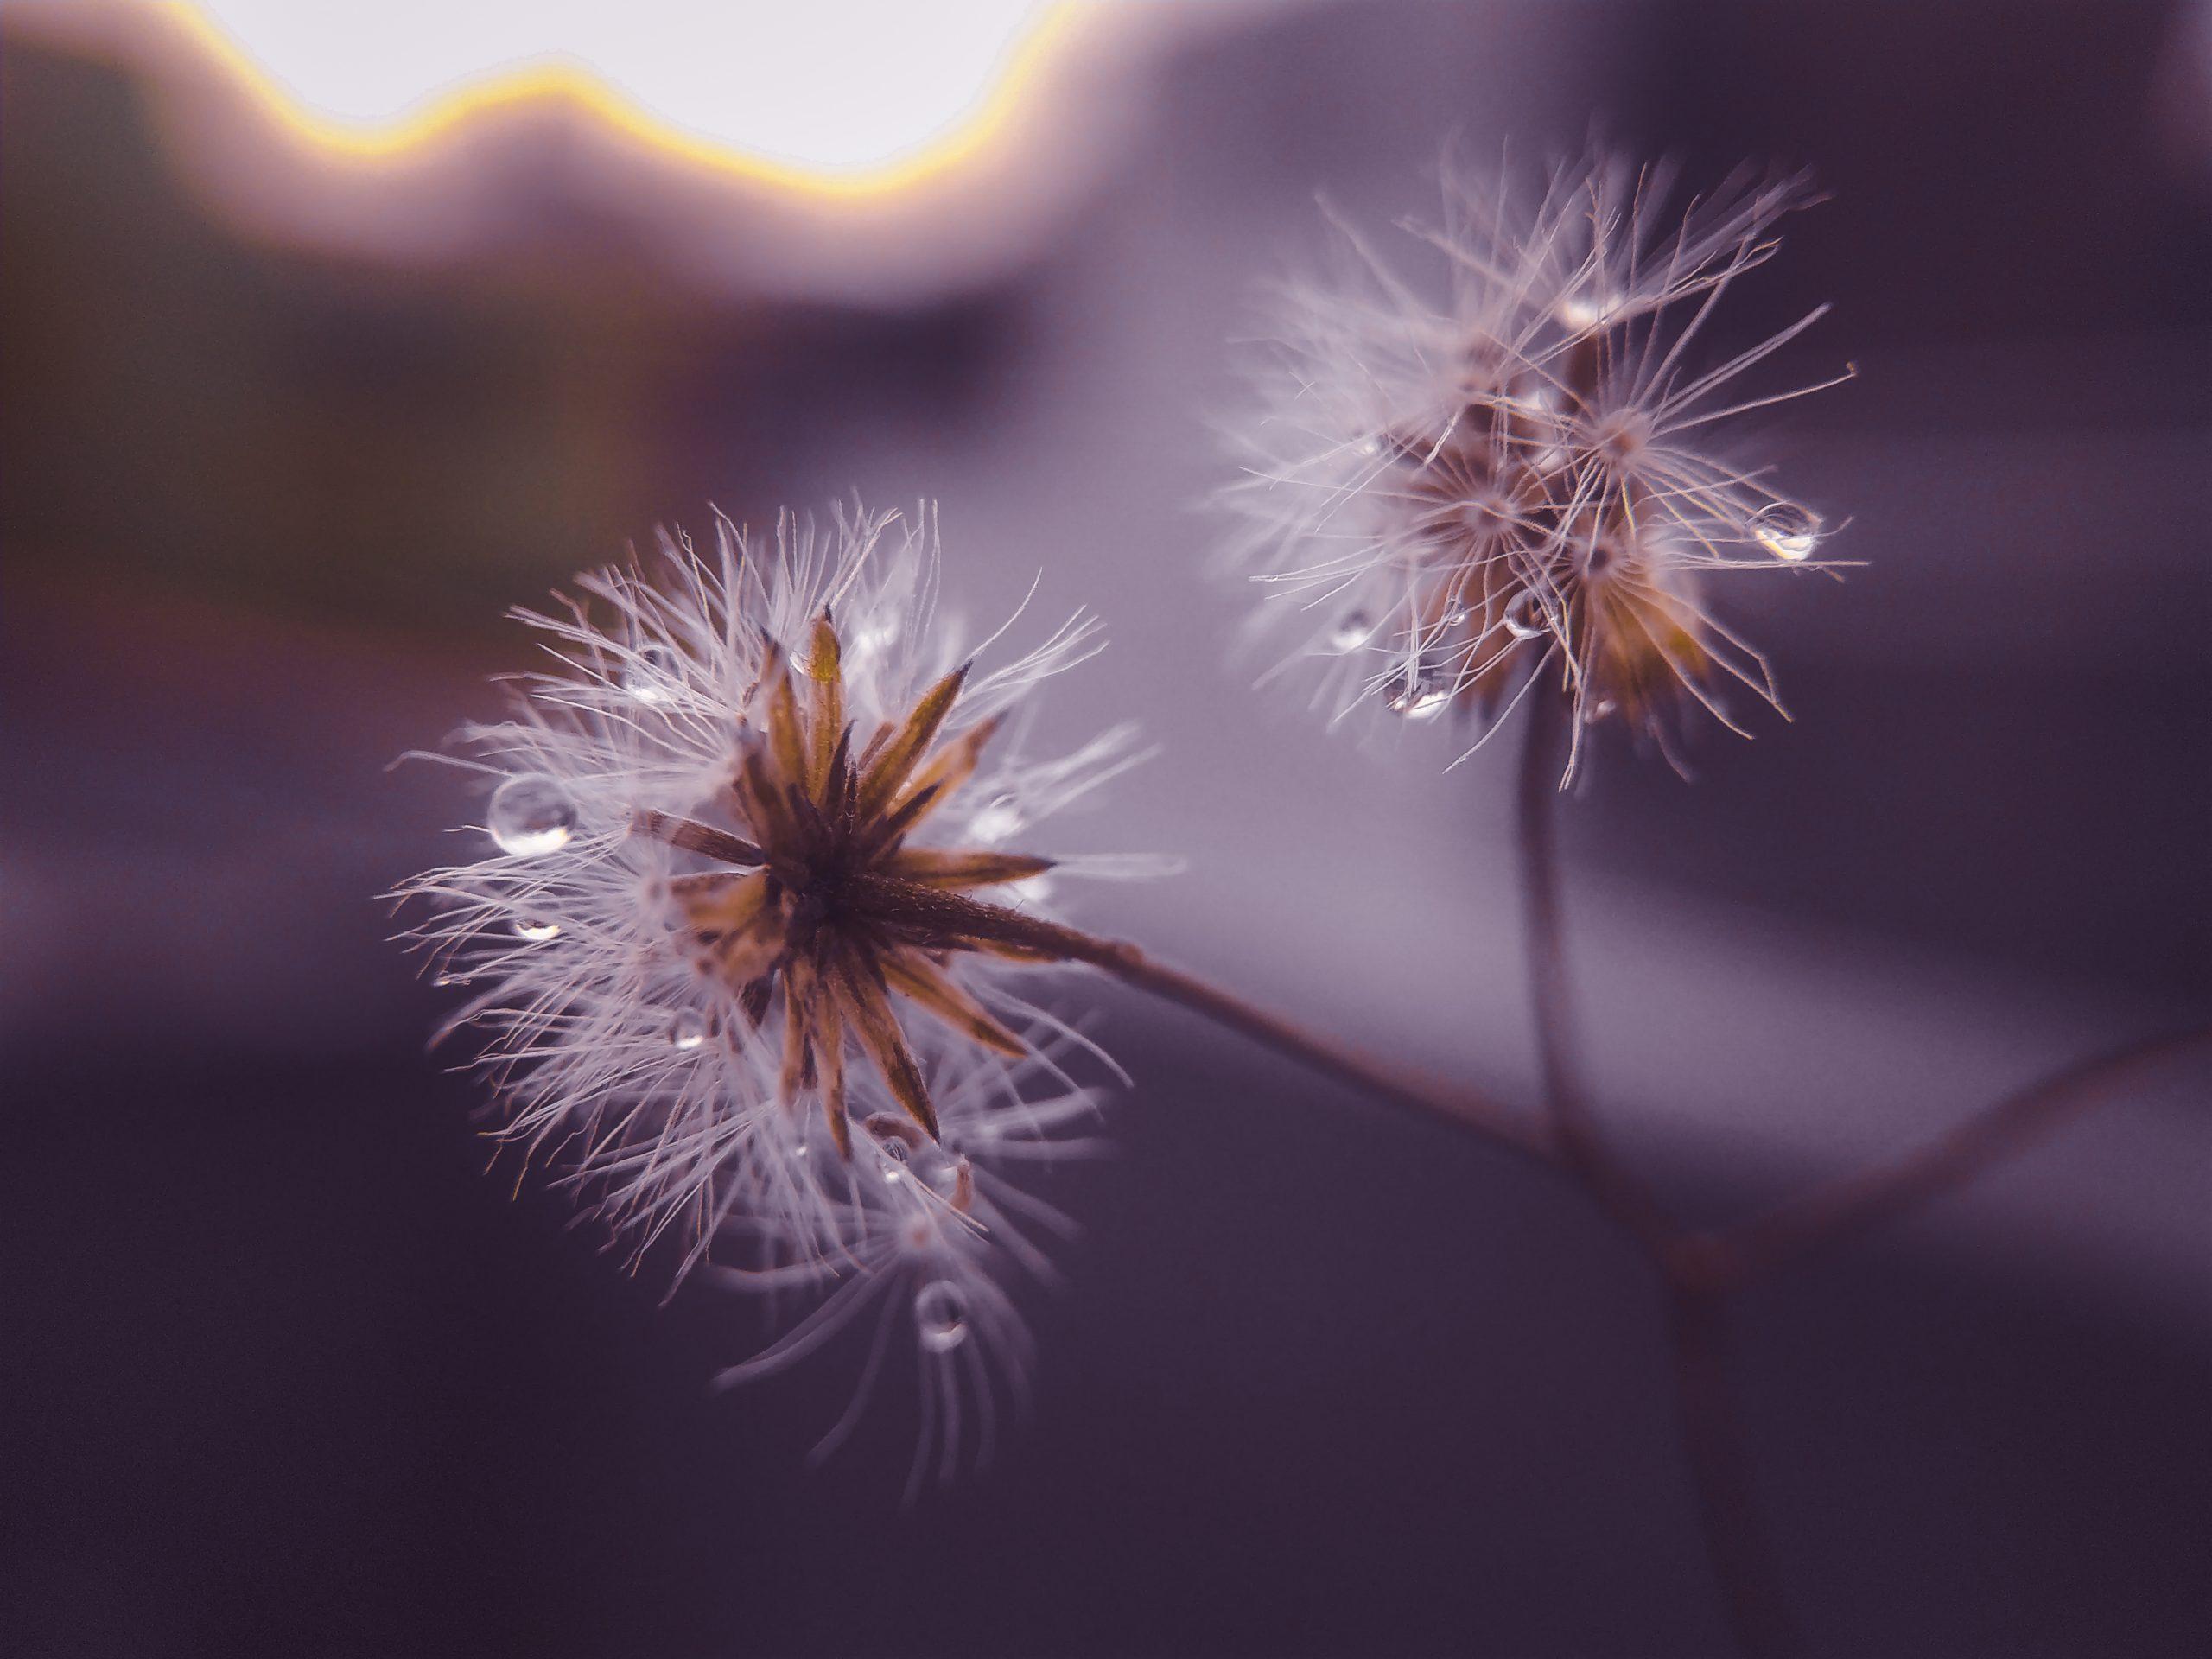 Moisture on white flowers